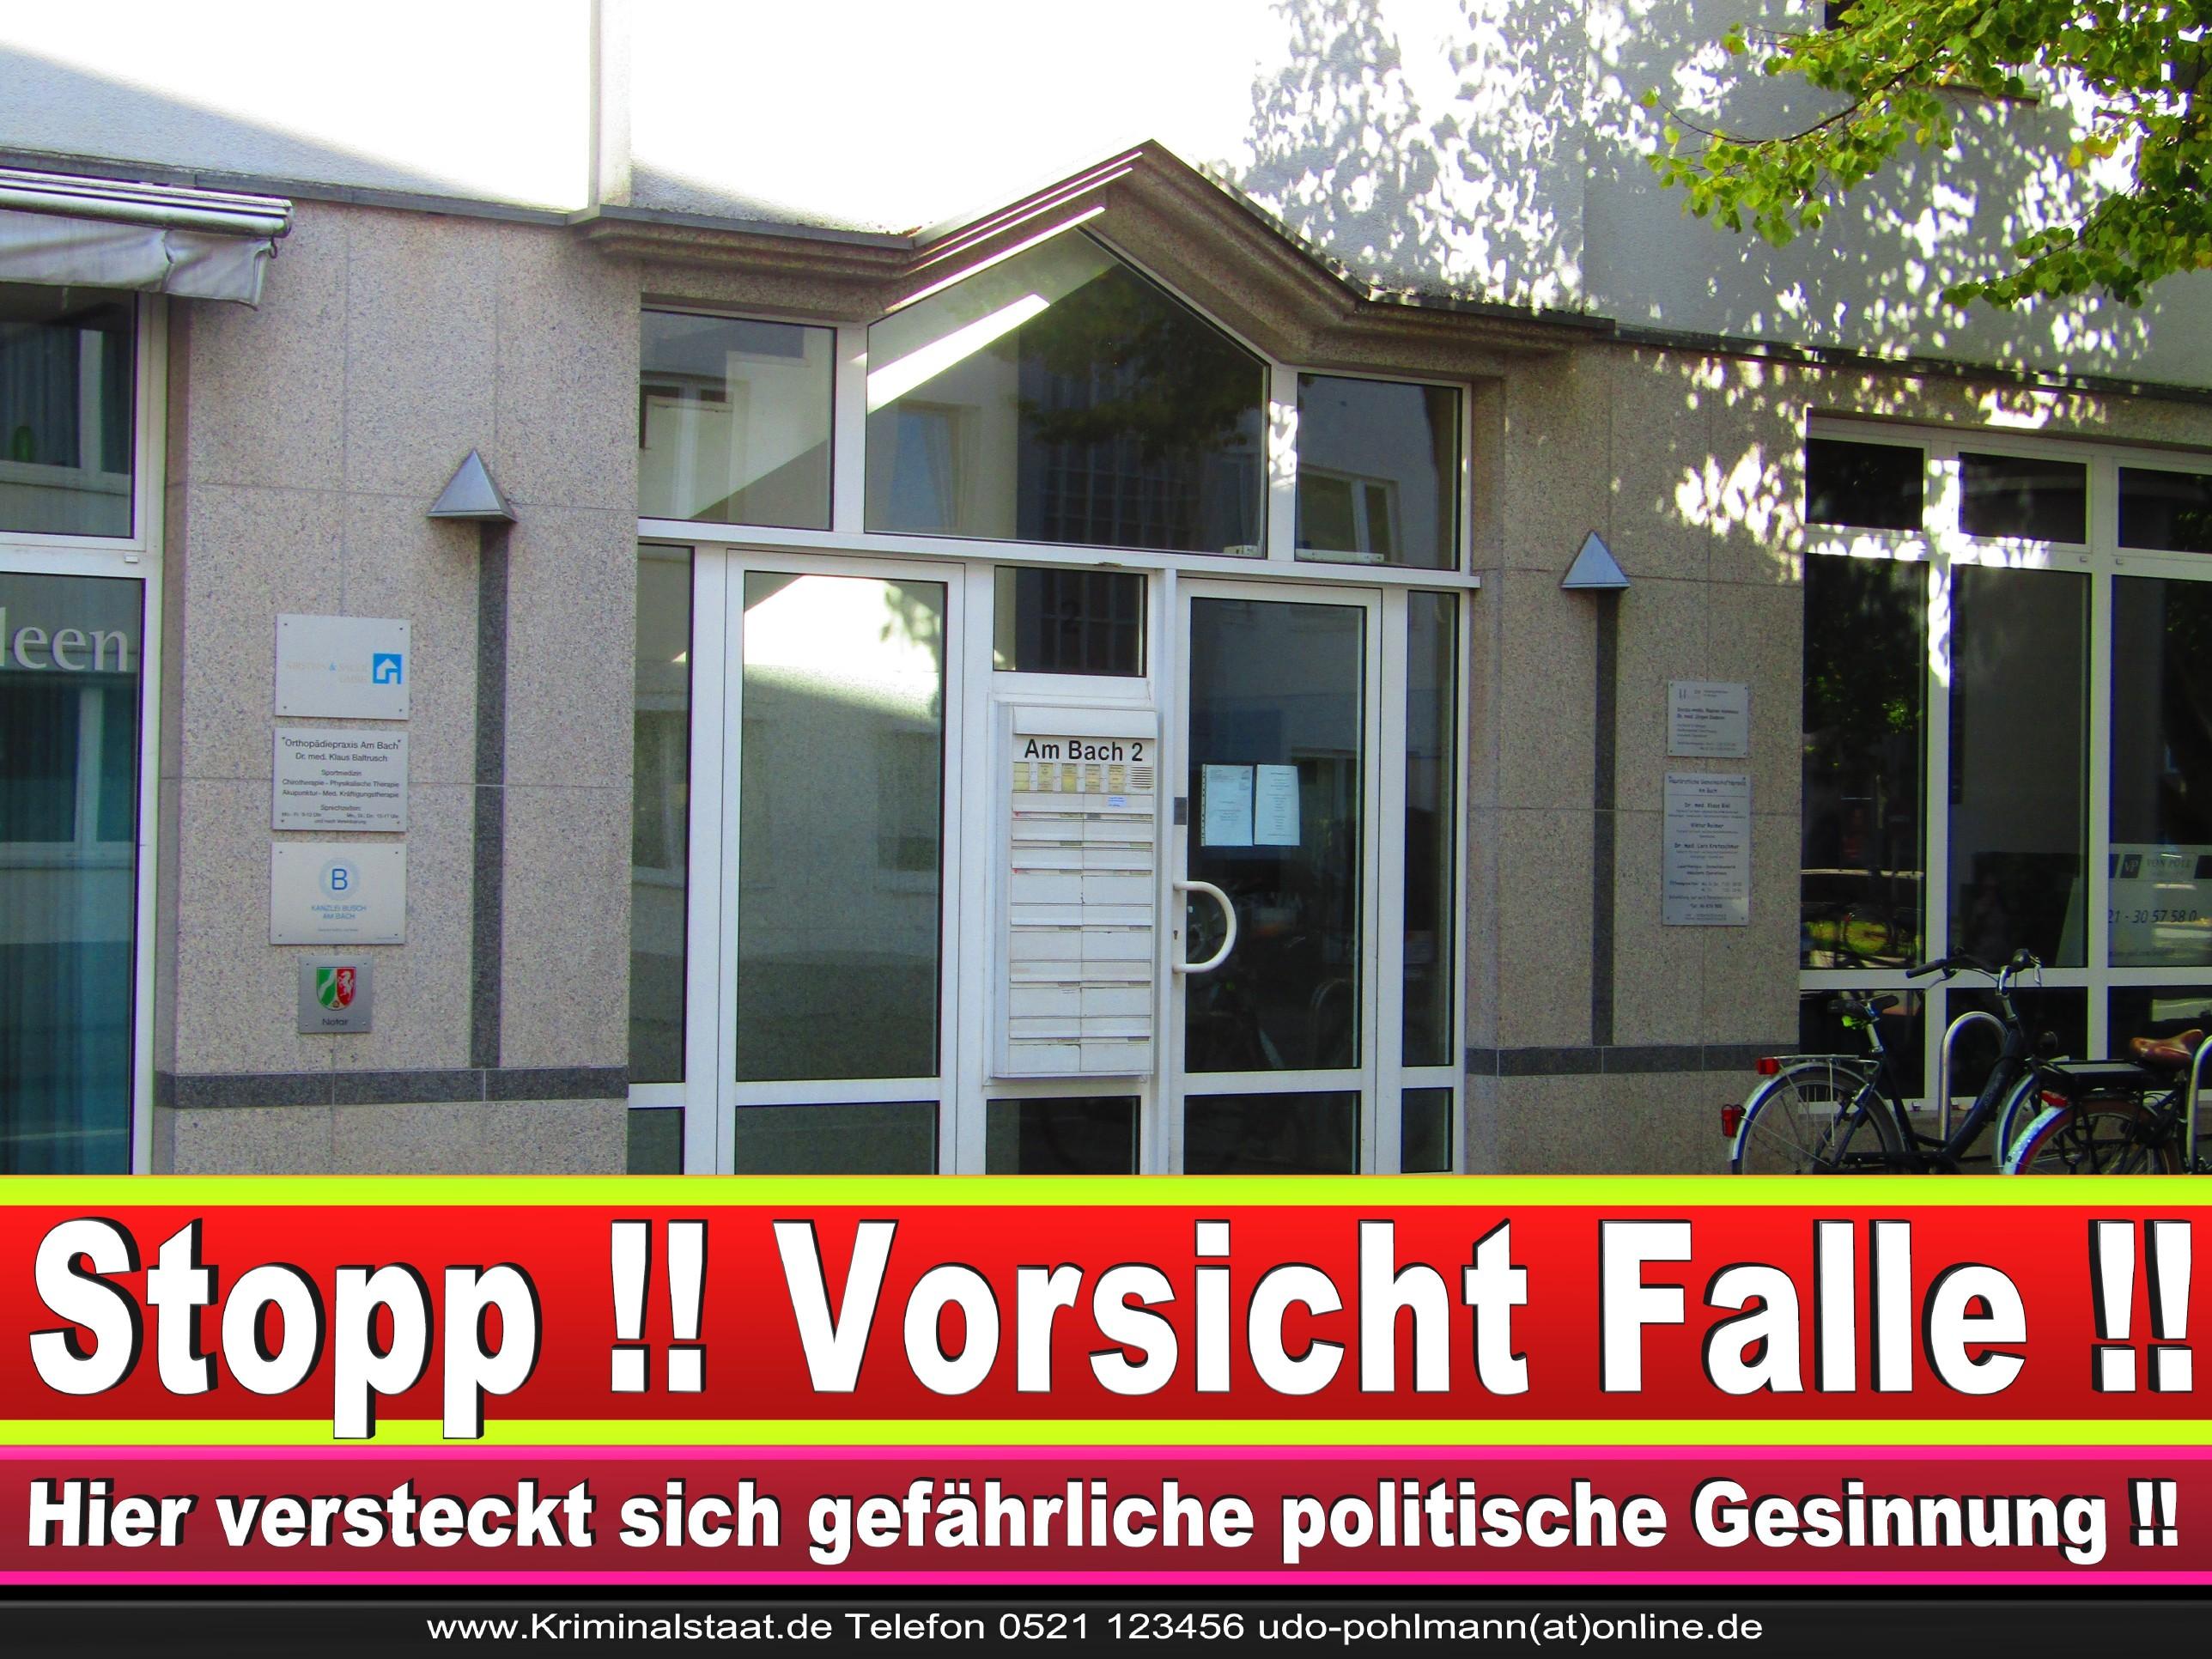 Rechtsanwältin Amelie Busch Am Bach 2 Bielefeld CDU 1